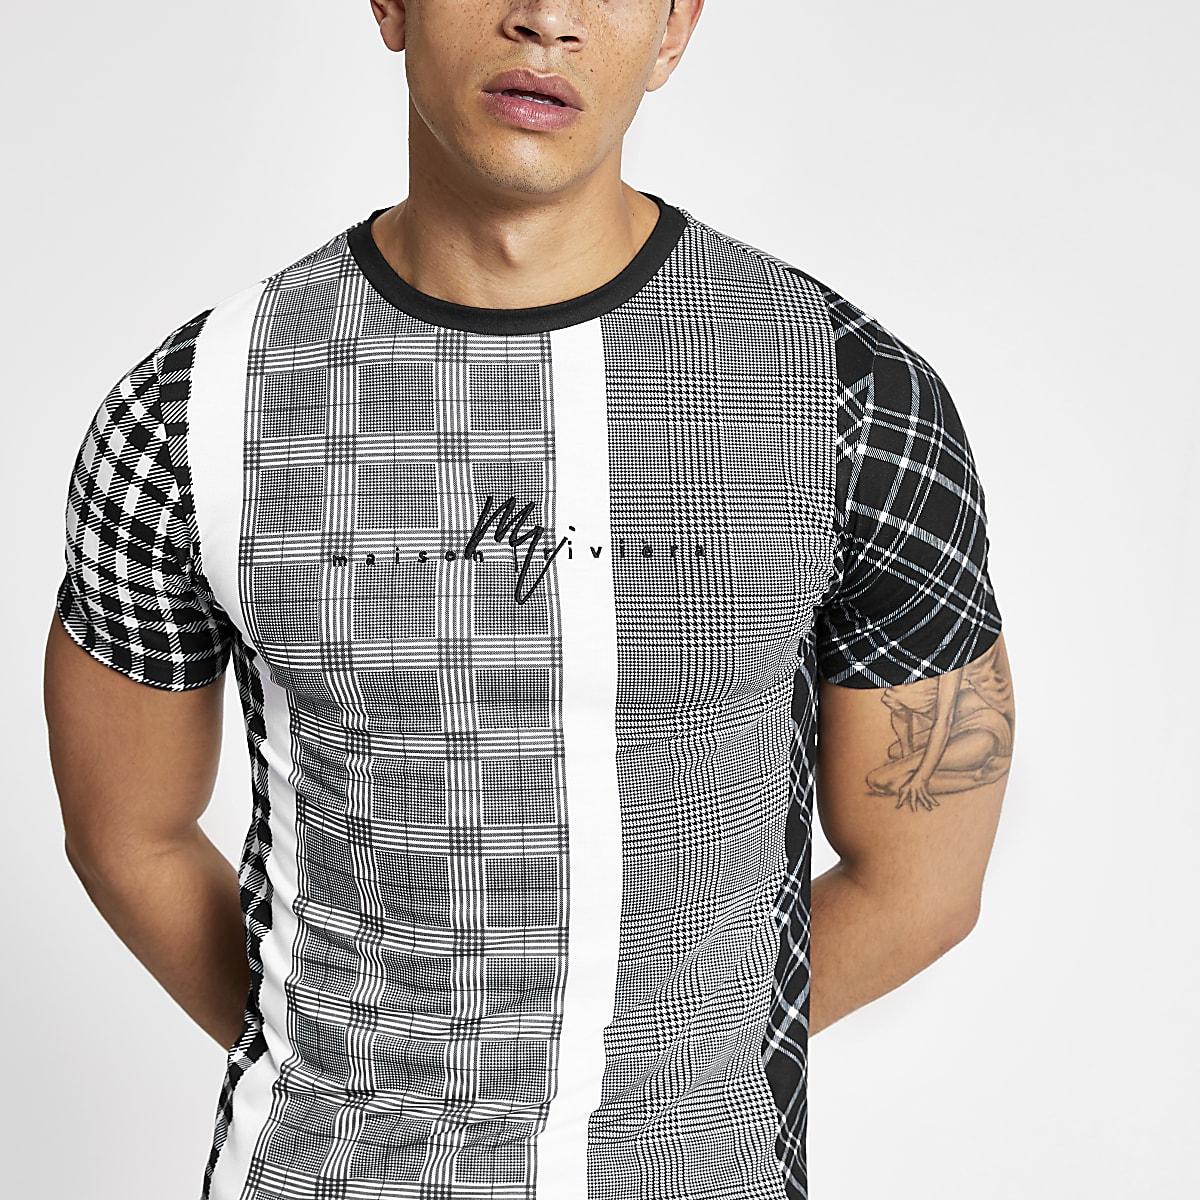 Black 'Maison Riviera' muscle fit T-shirt